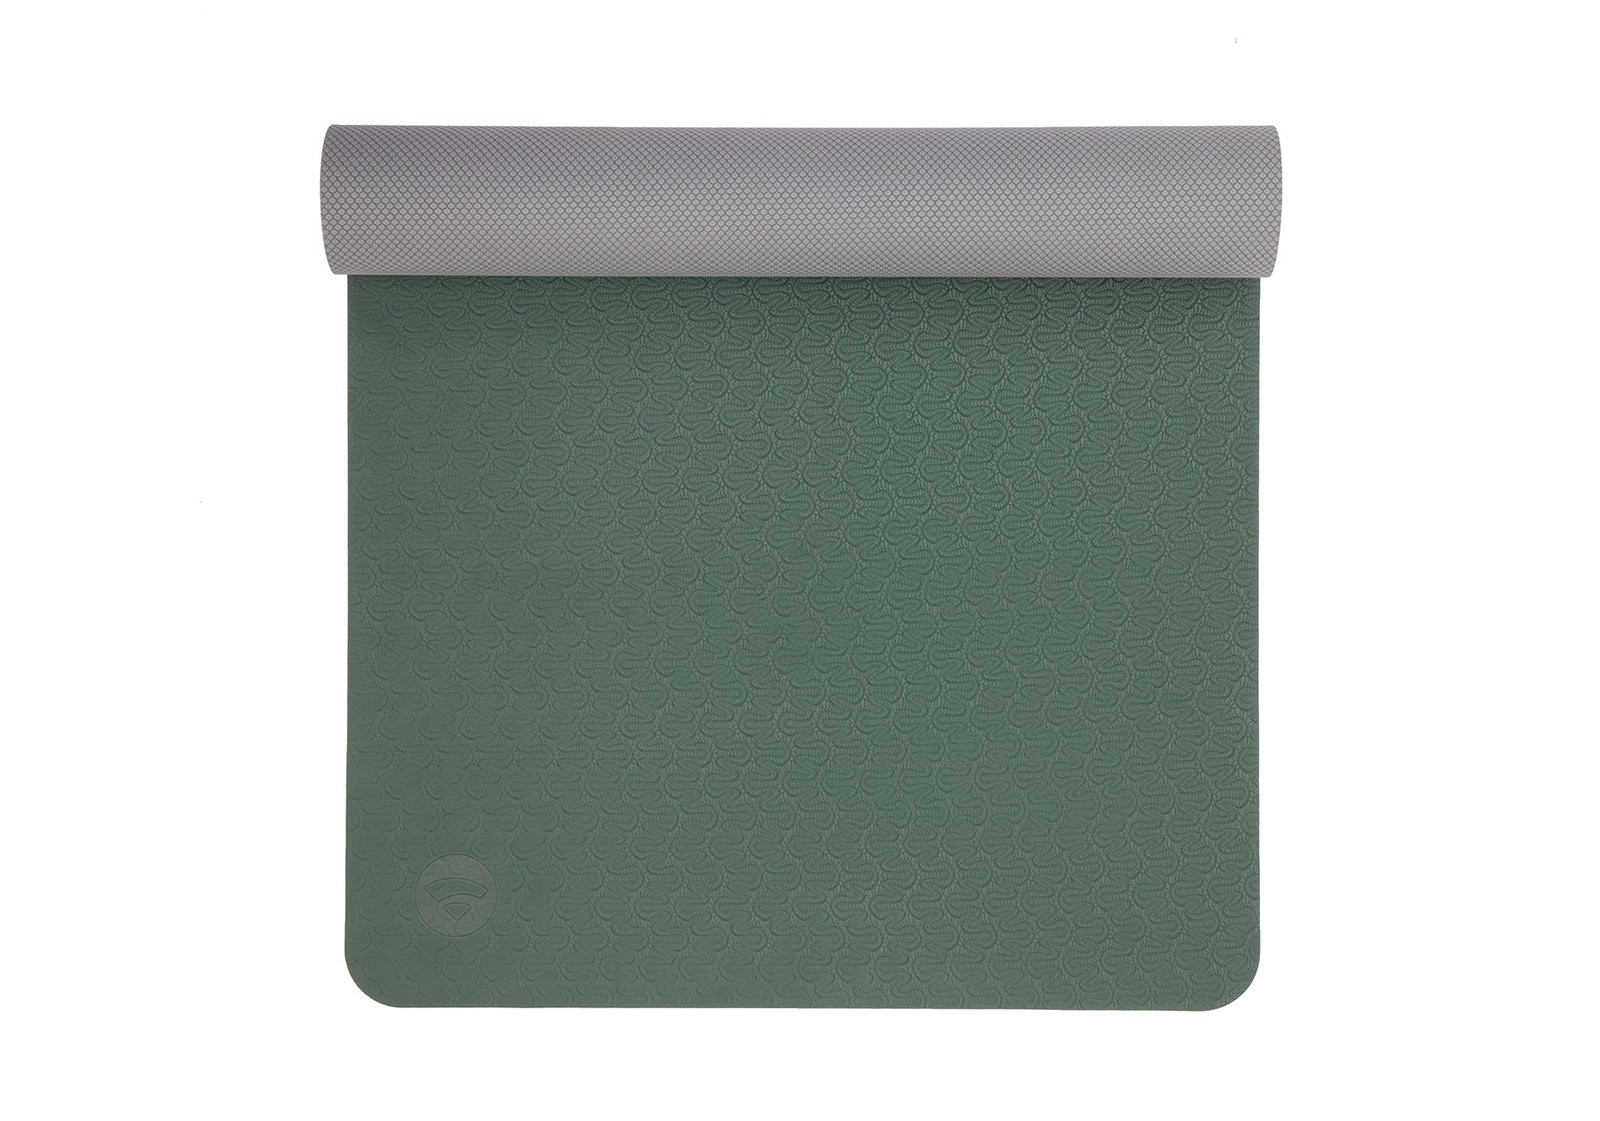 kovrik-dlya-jogi-lotus-pro-light-ot-bodhi-deep-green-antracite-2021-01